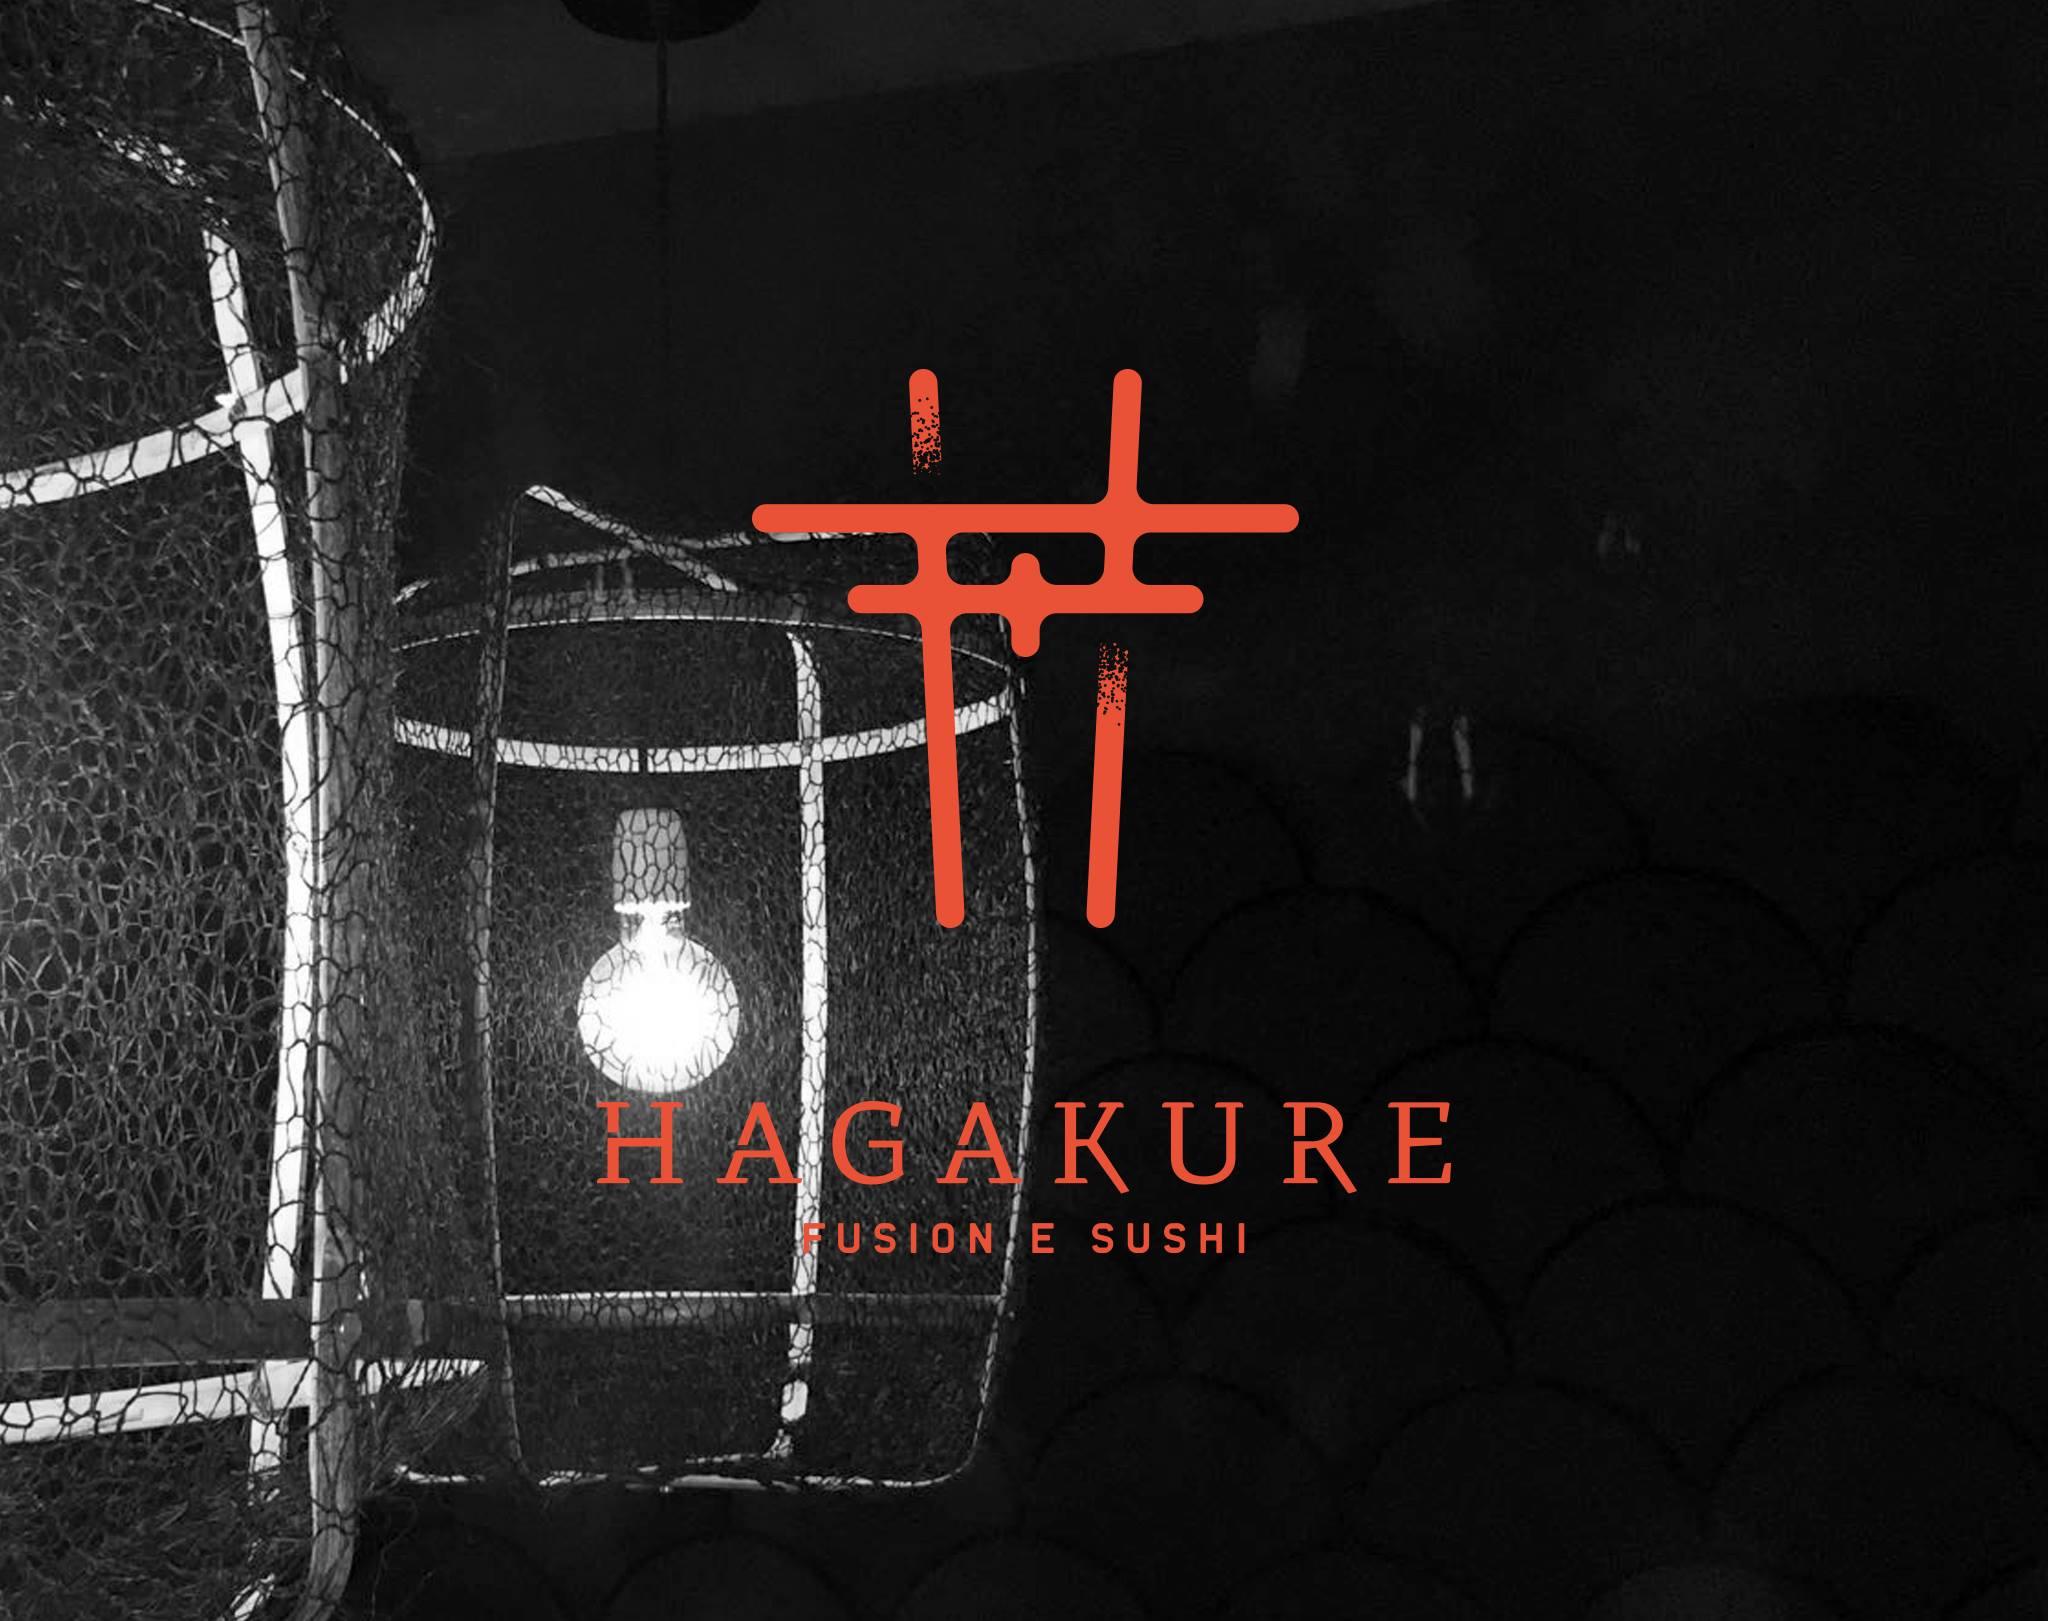 hagakure sushi fusion RE-OPENING | HAGAKURE - BARI AMENDOLA